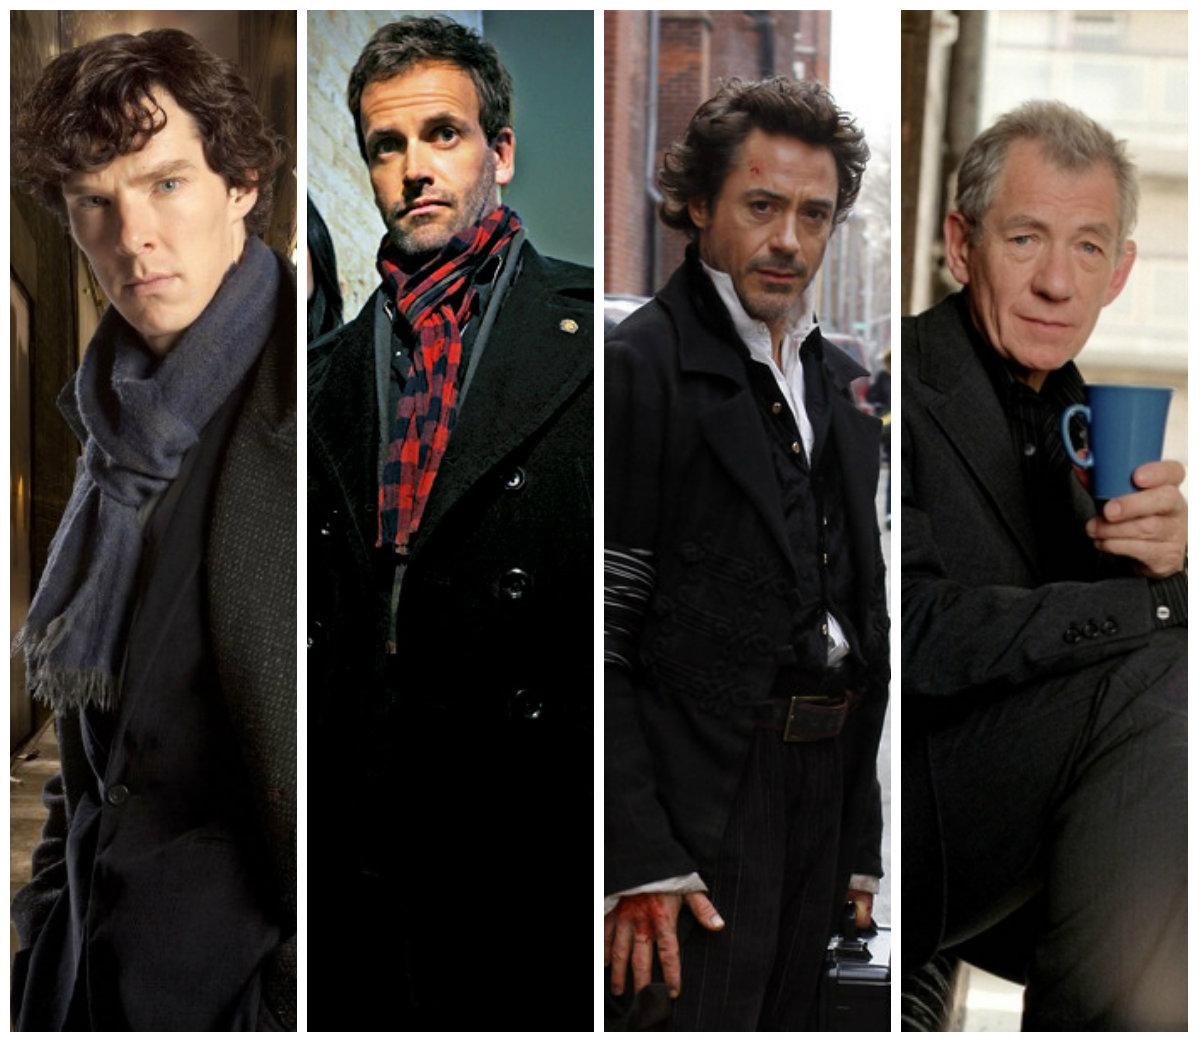 Tutti i recenti Sherlock Holmes. Da sinistra: benedict cumberbatch (Sherlock - BBC), Jonny Lee Miller (Elementary - CBS), Robert Downey Jr (Sherlock Holmes - Guy Ritchie), Ian McKellen (Mr Holmes)